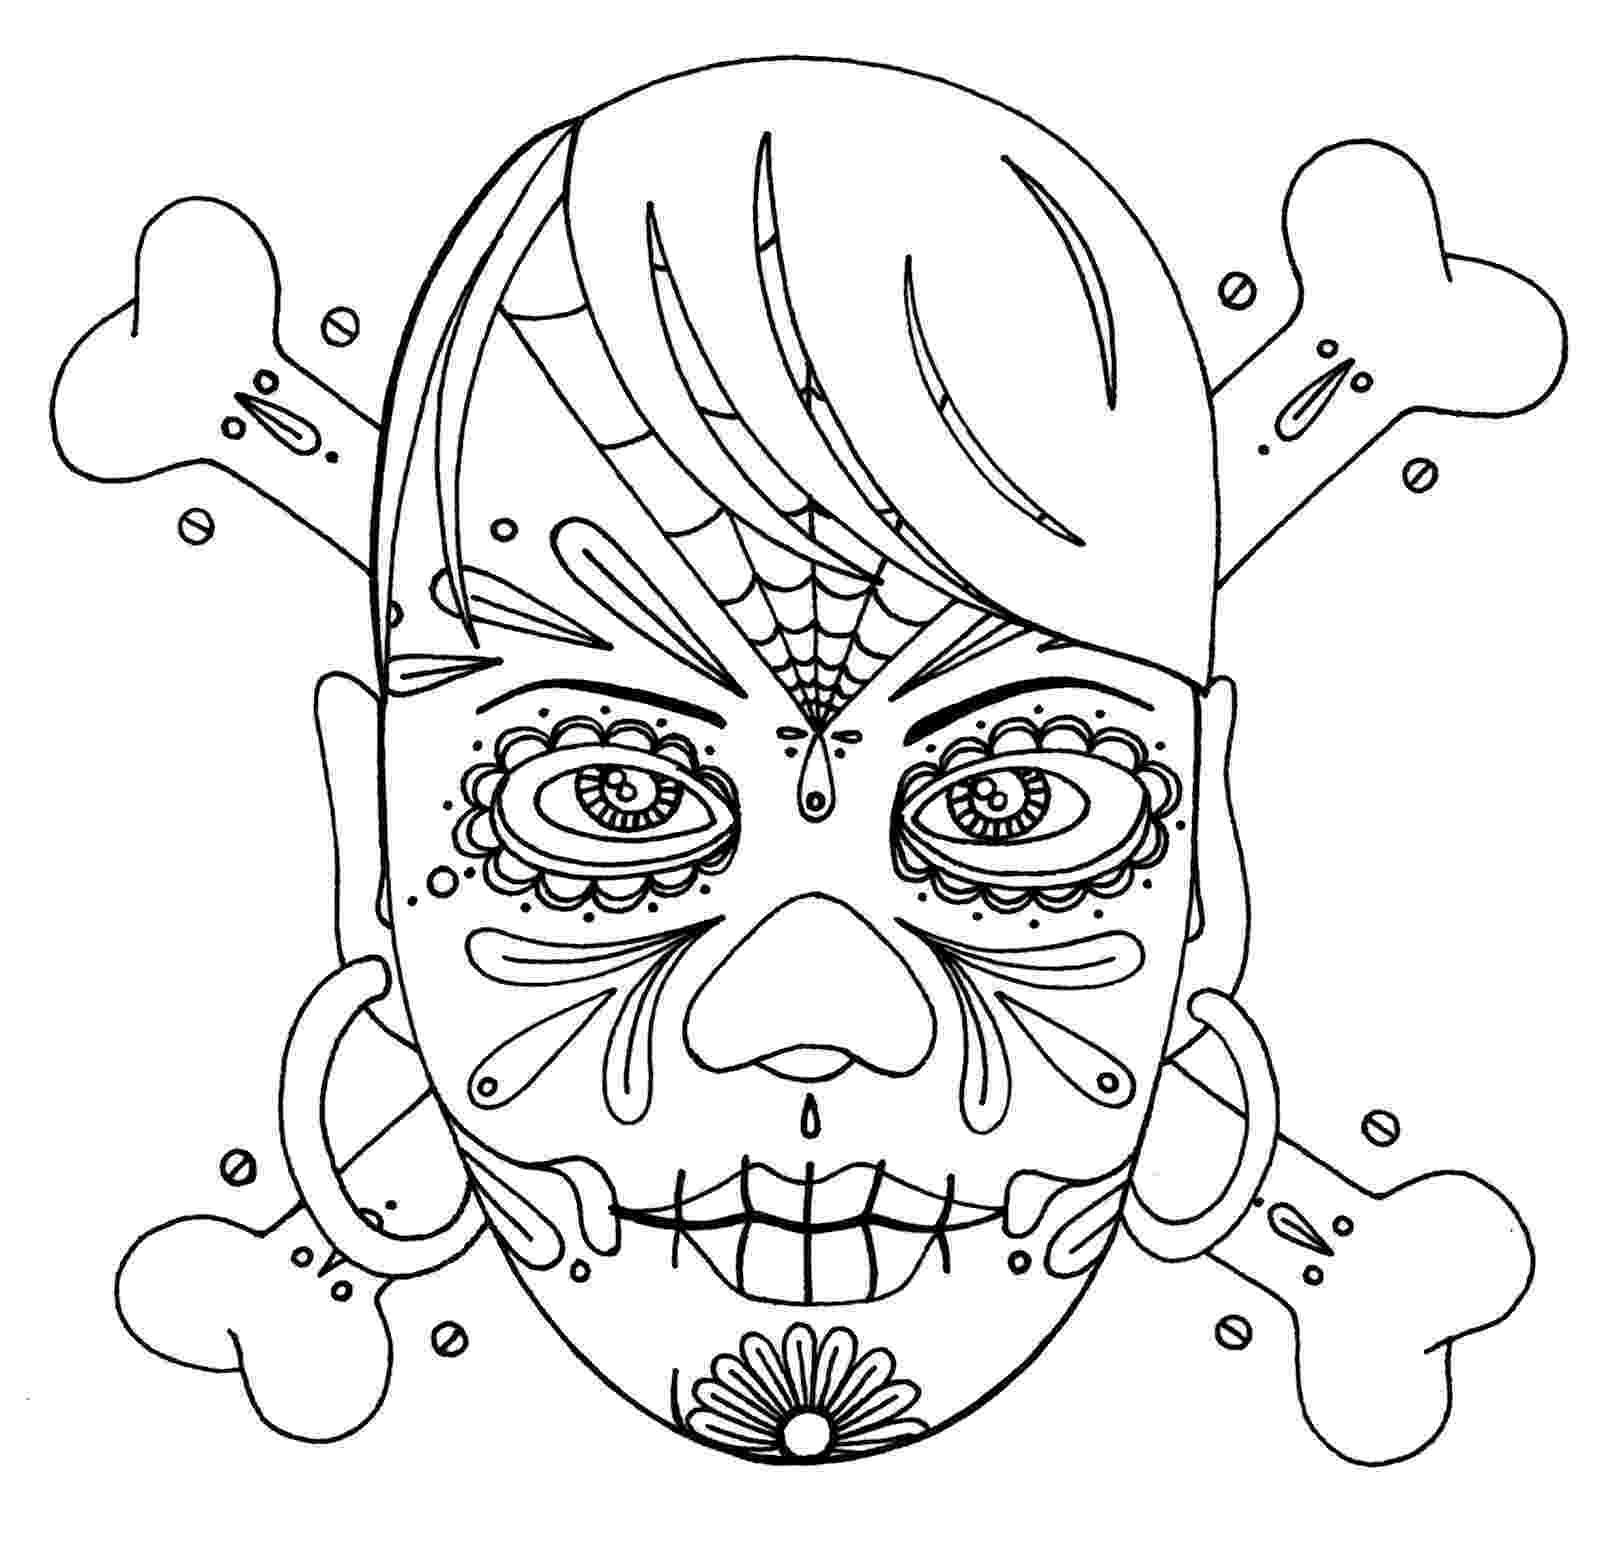 skull coloring sheet free printable skull coloring pages for kids coloring sheet skull